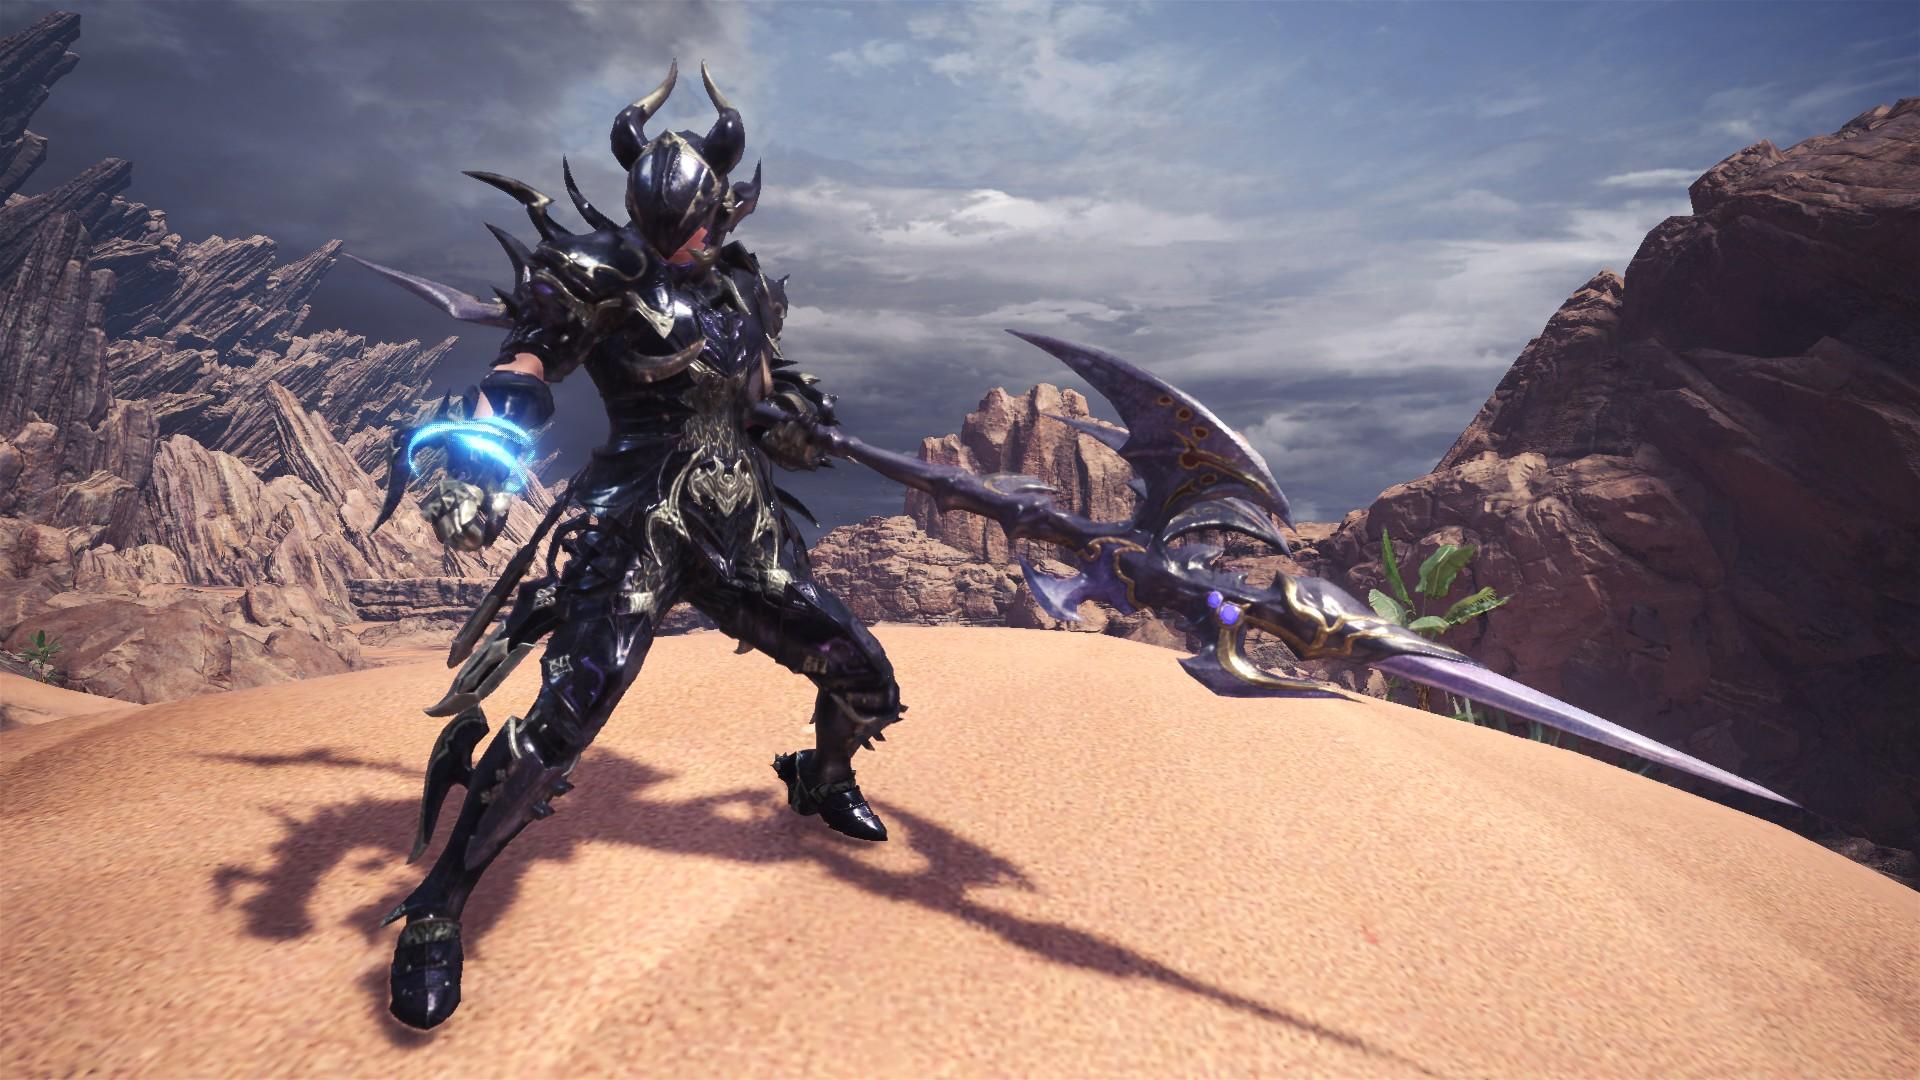 Le B 233 H 233 Moth De Final Fantasy Xiv S Invite 224 Coups De